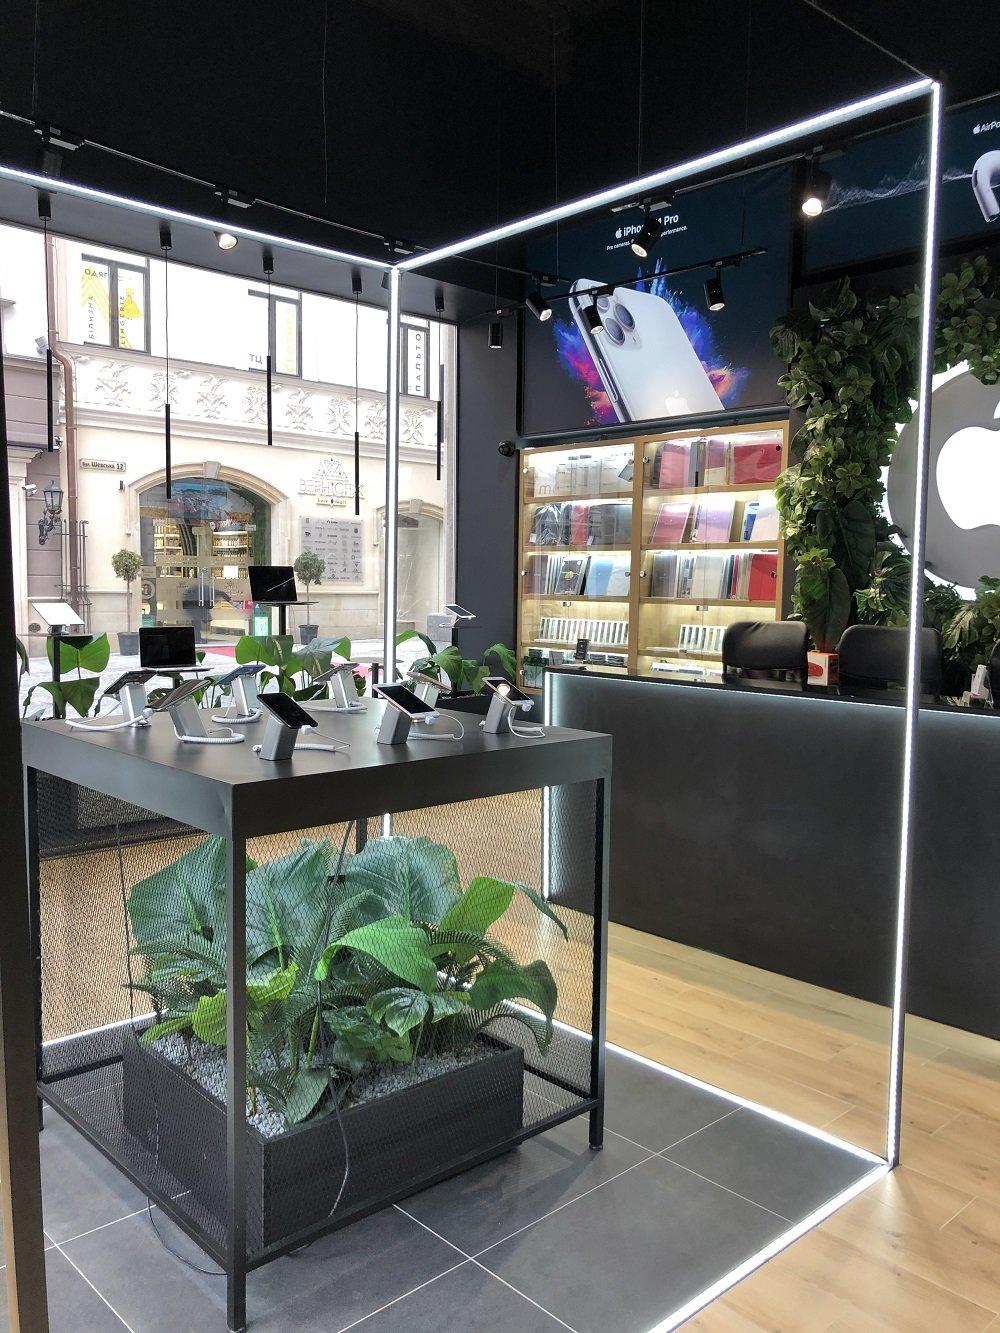 iPhone SE 2020 – найдешевший смартфон Apple вже в Apple Room, фото-7